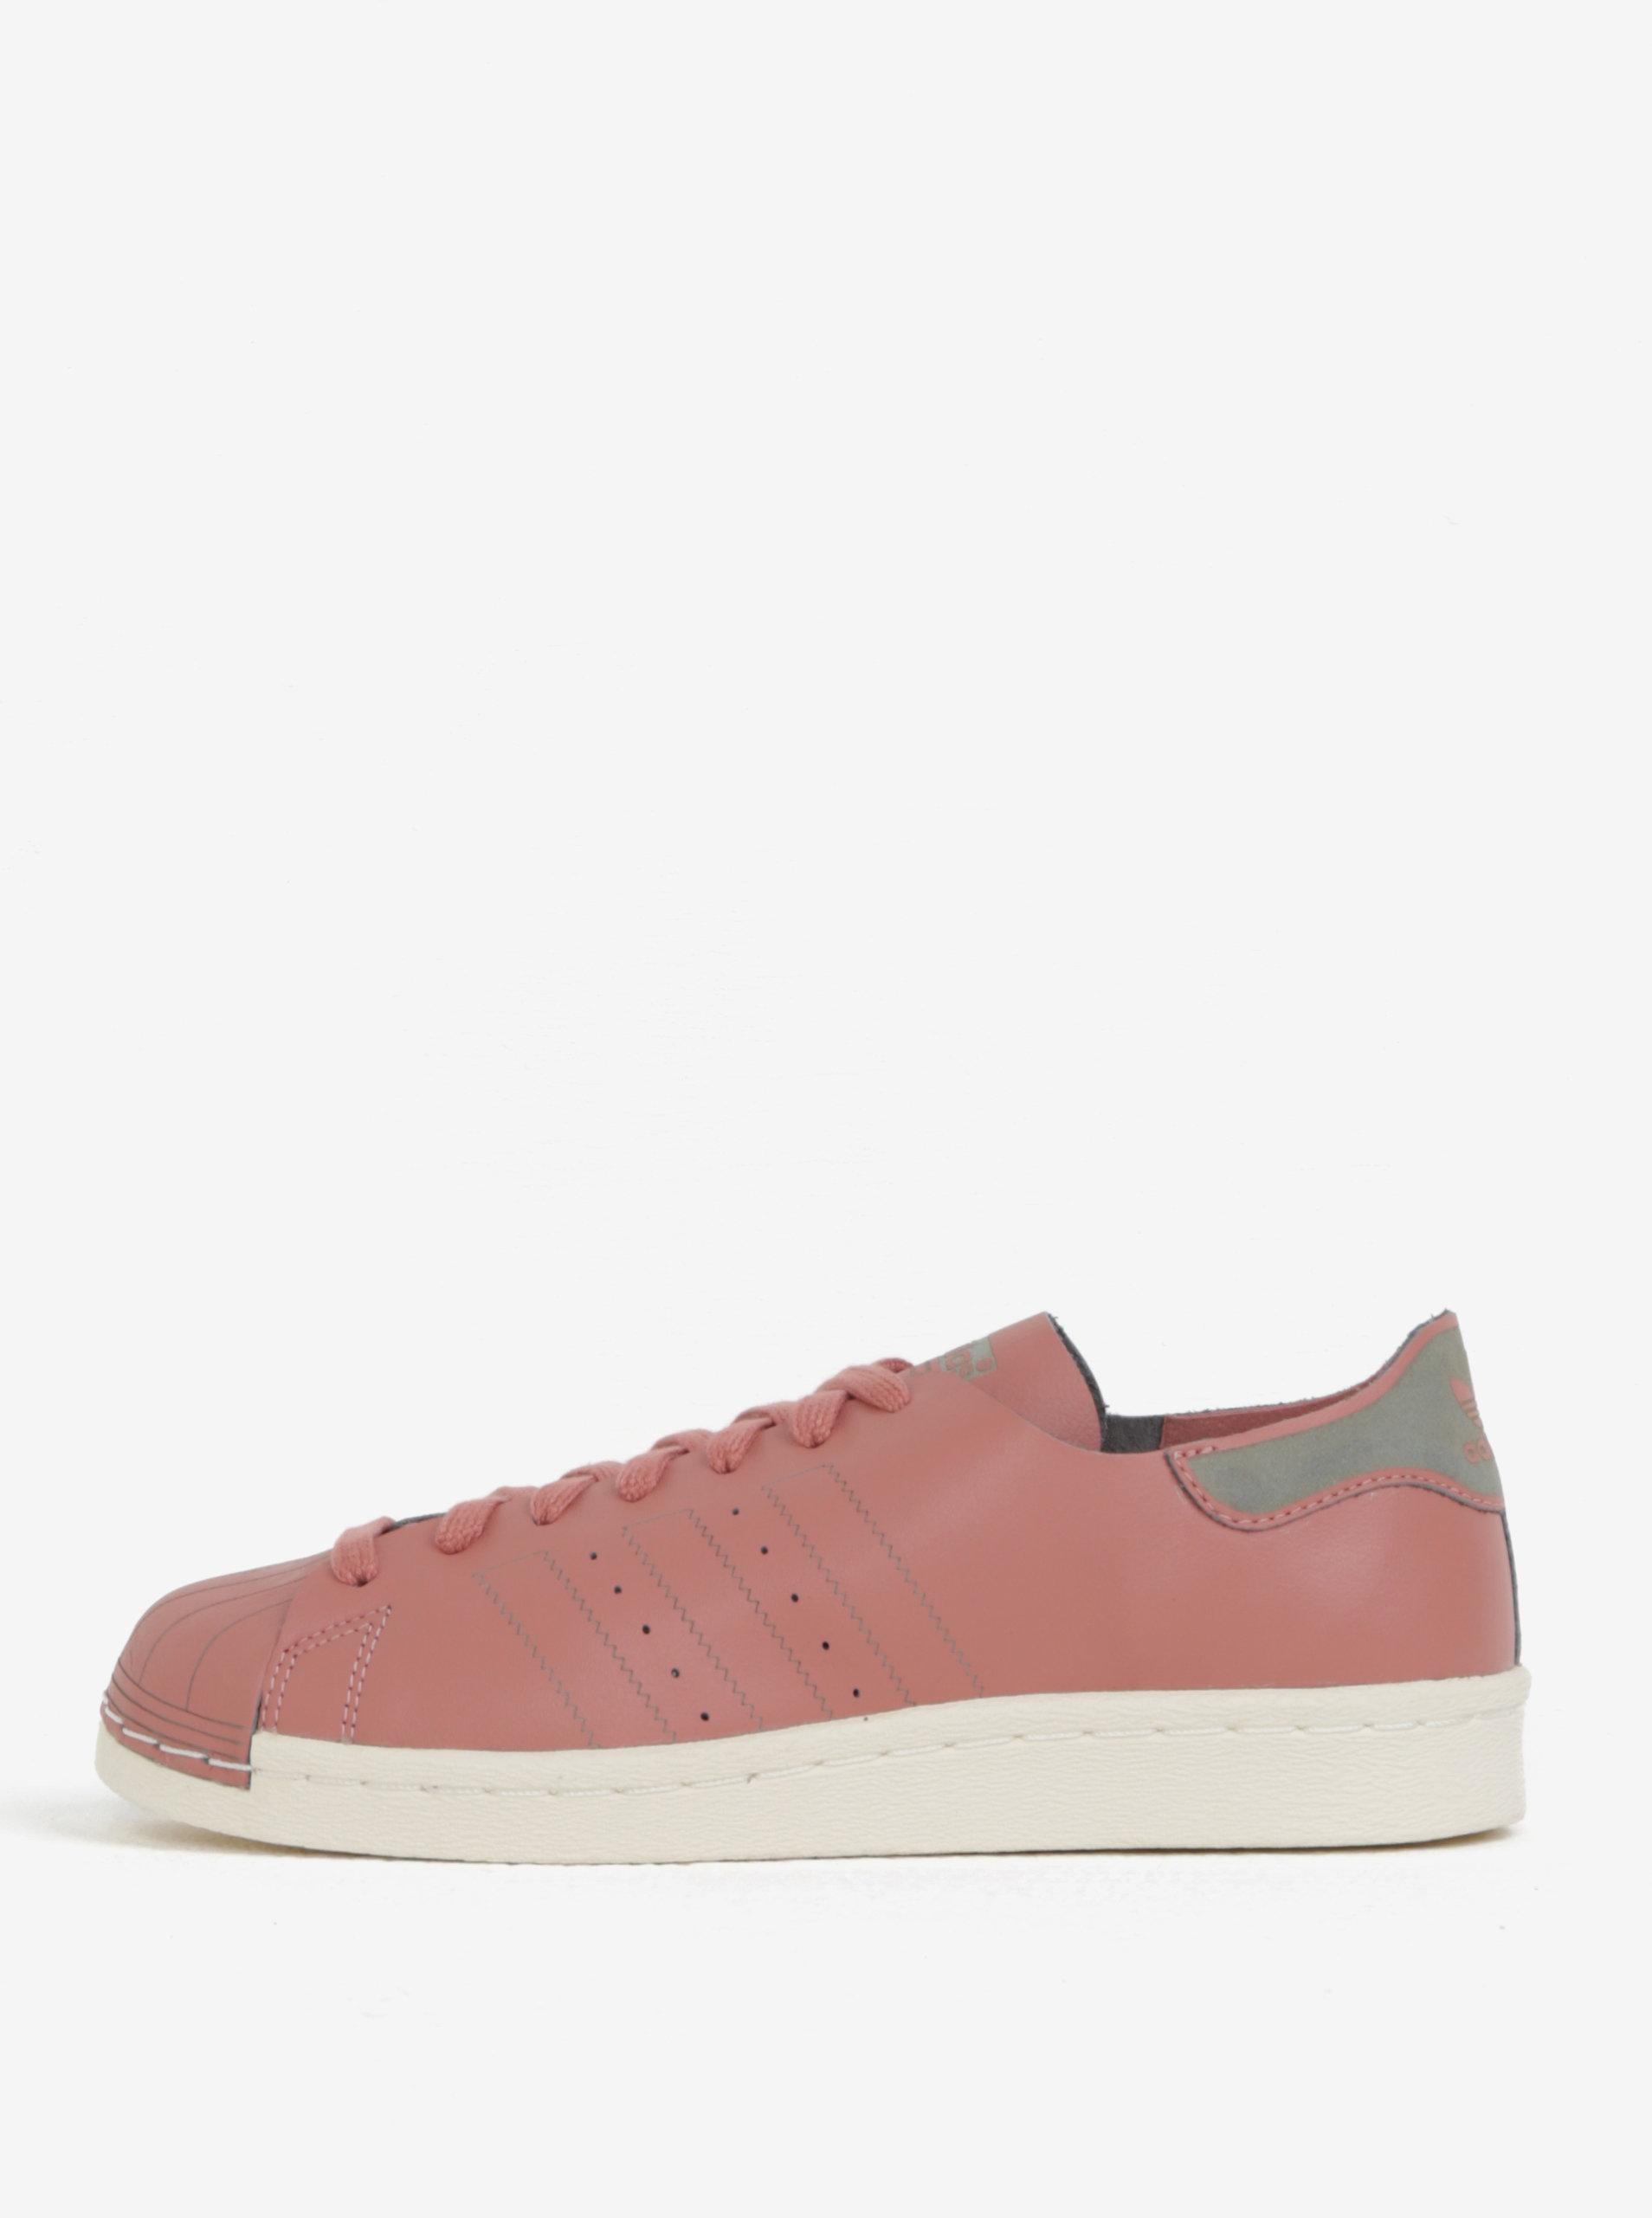 Staroružové dámske kožené tenisky adidas Originals Superstar ... 191f3089d46